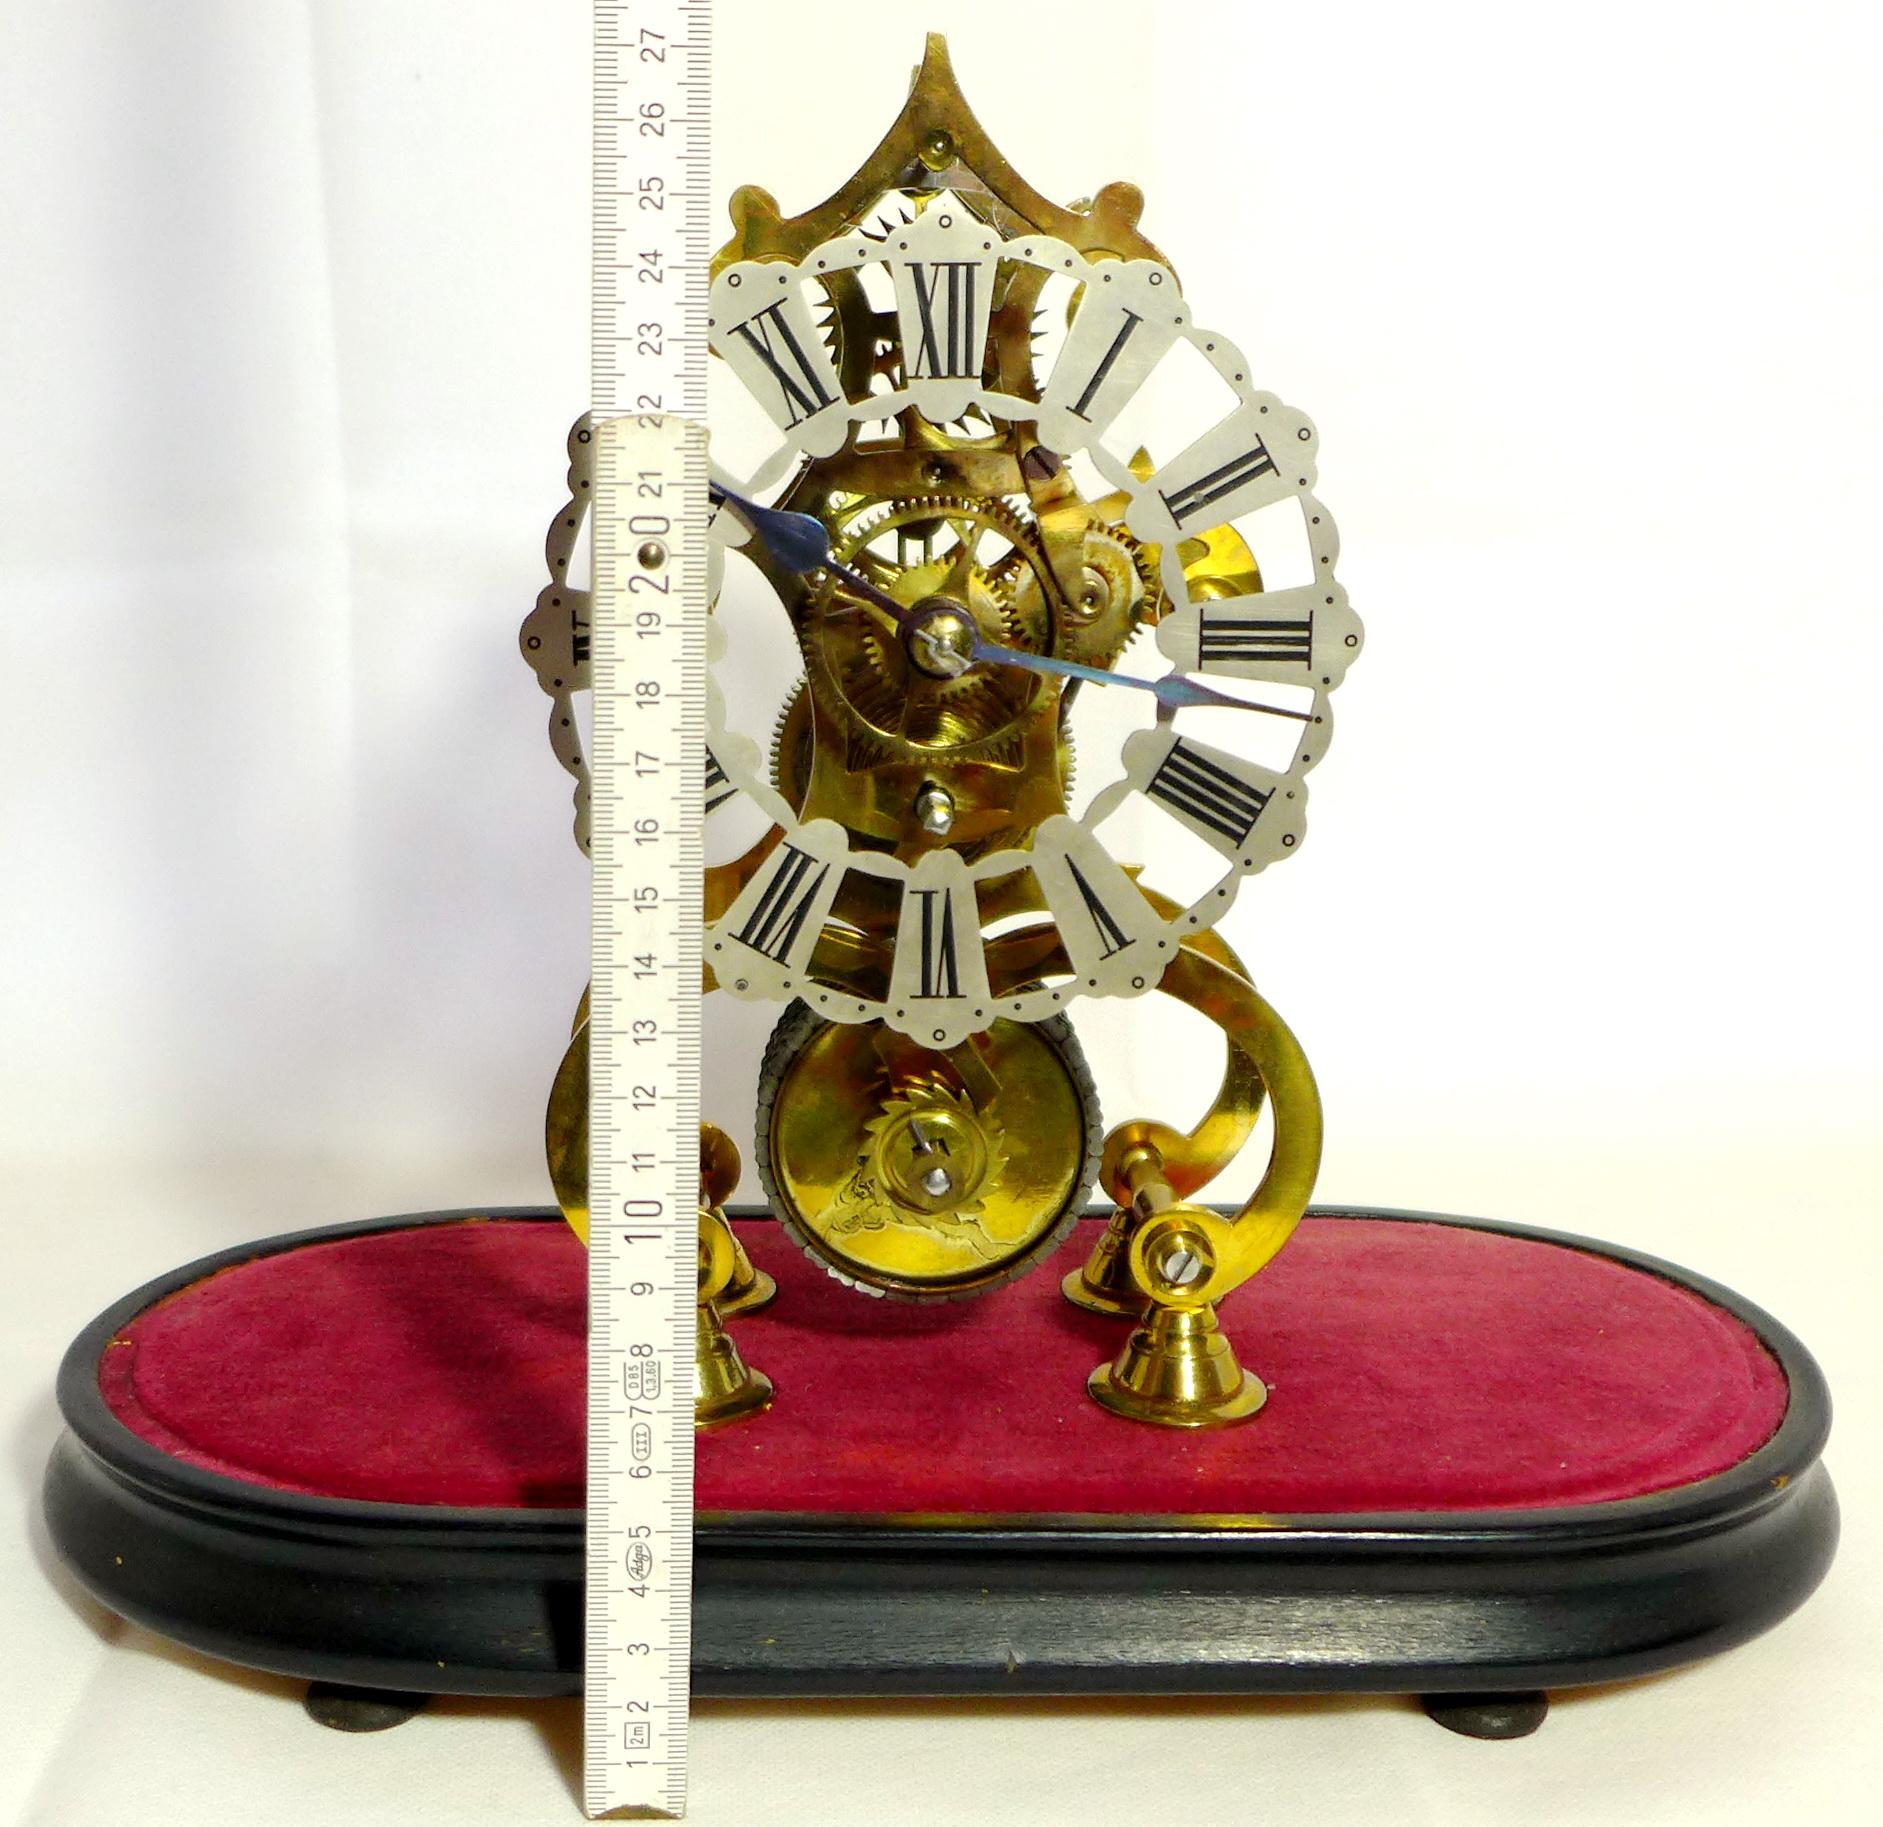 skelettierte tischuhr skeleton clock england um 1870 mit glasdom selten ebay. Black Bedroom Furniture Sets. Home Design Ideas